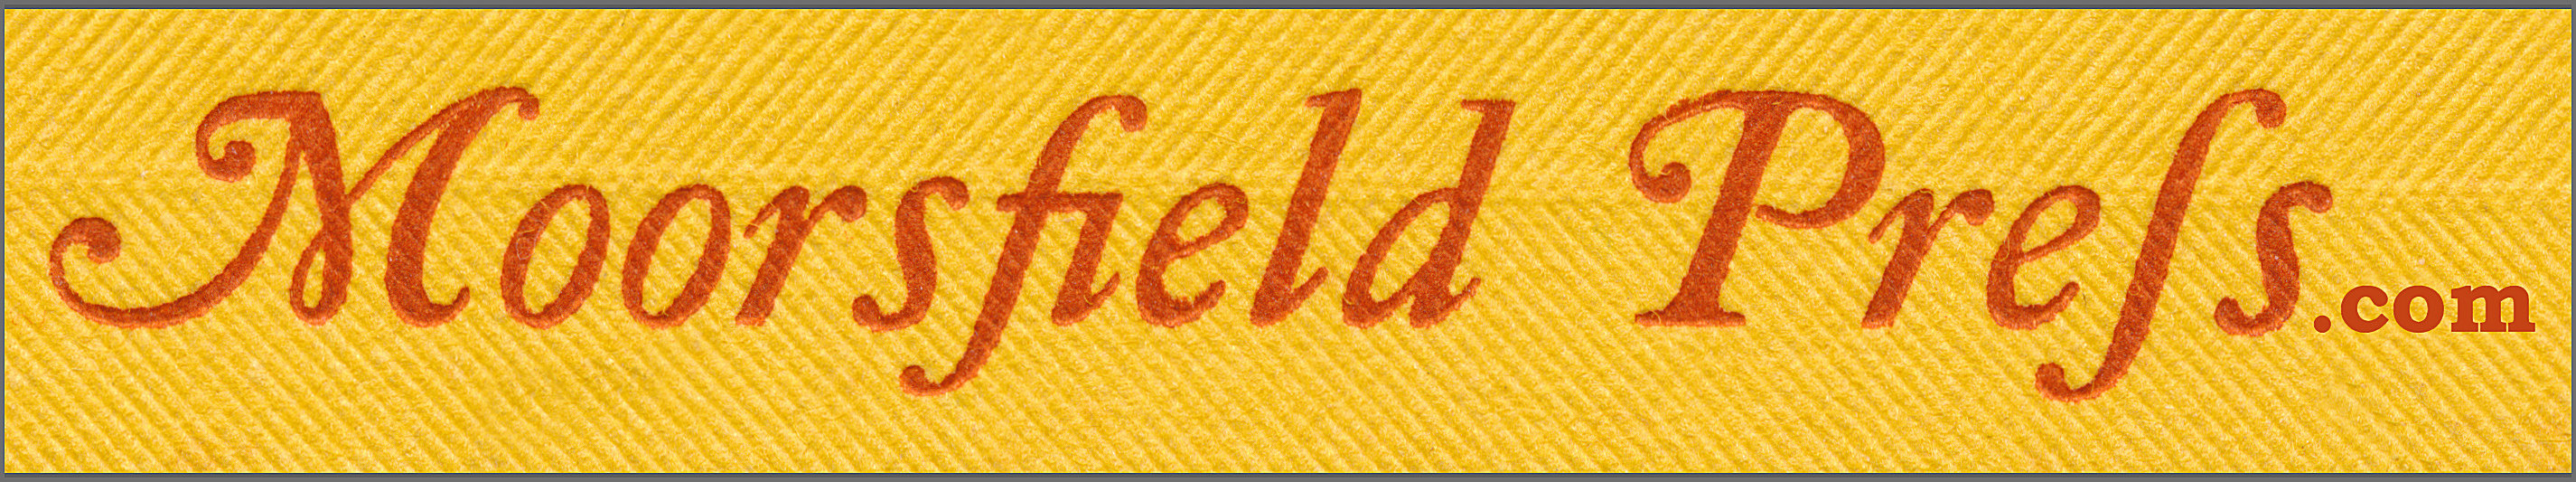 moorsfield press.com banner image